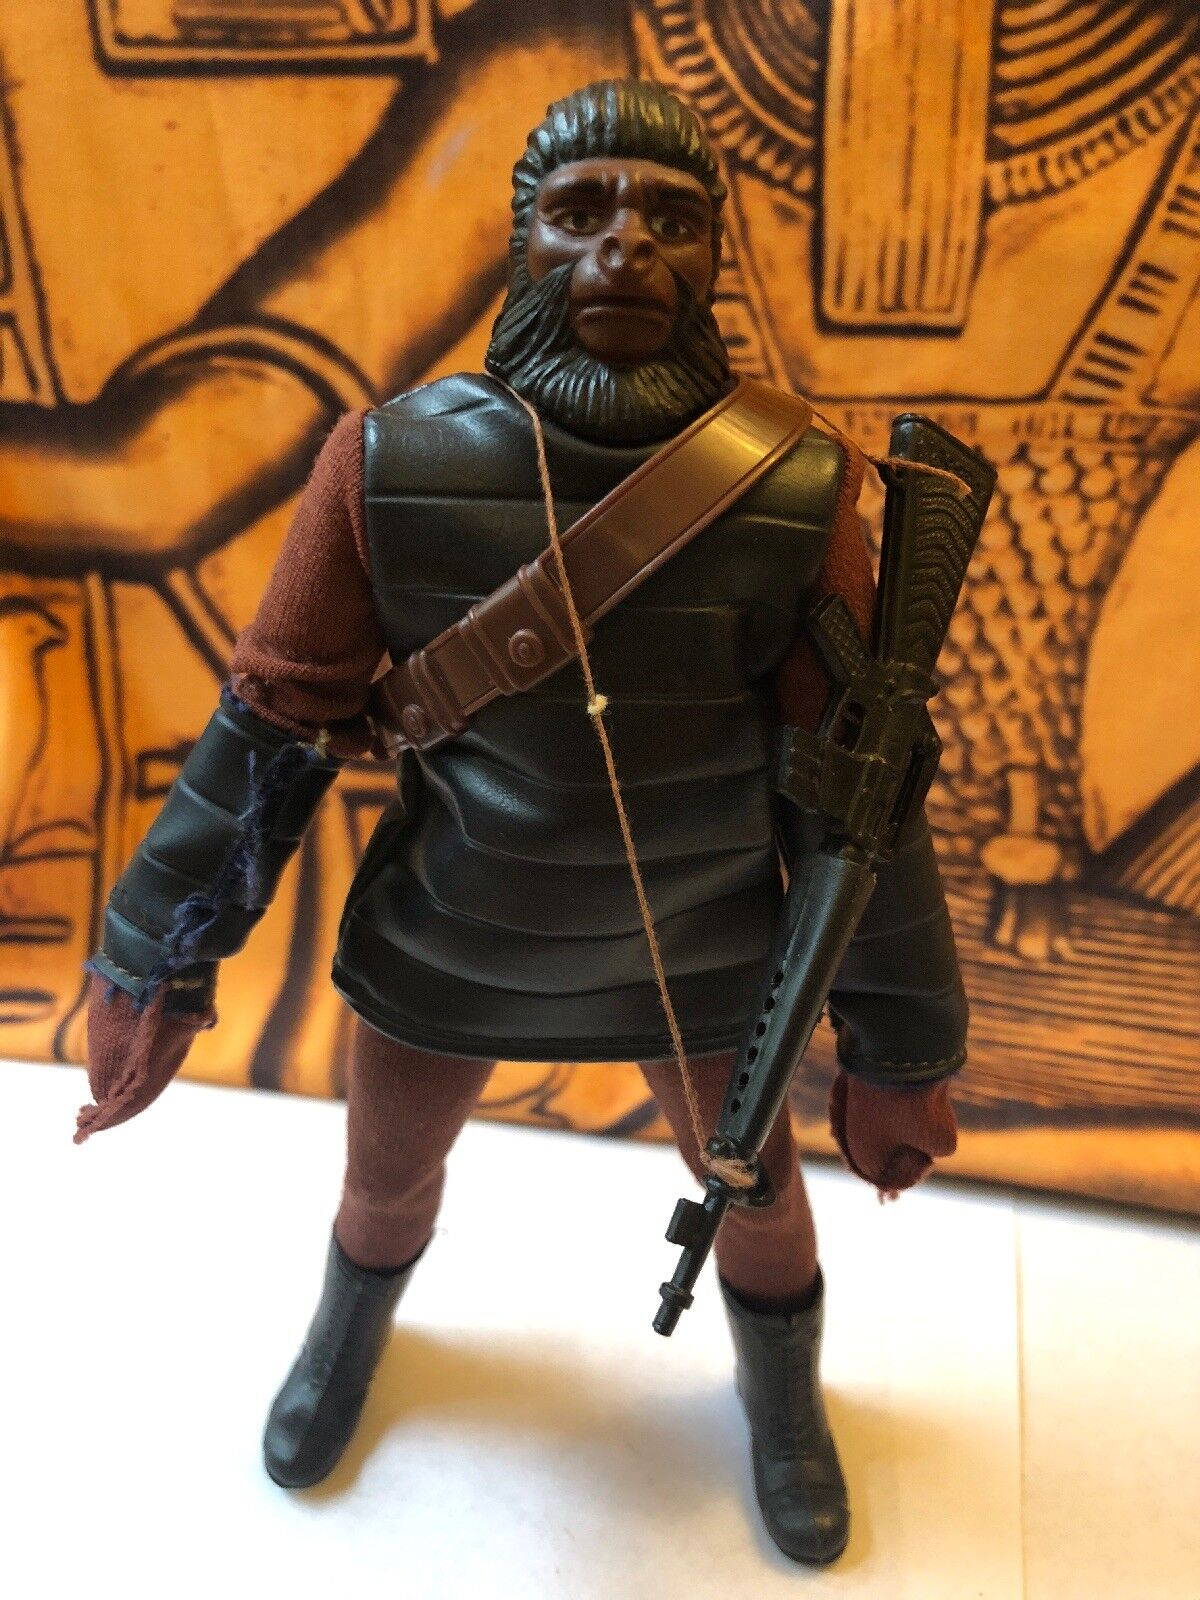 Vintage Mego Planet Of The Apes Soldier Ape Action Figure Complete POTA